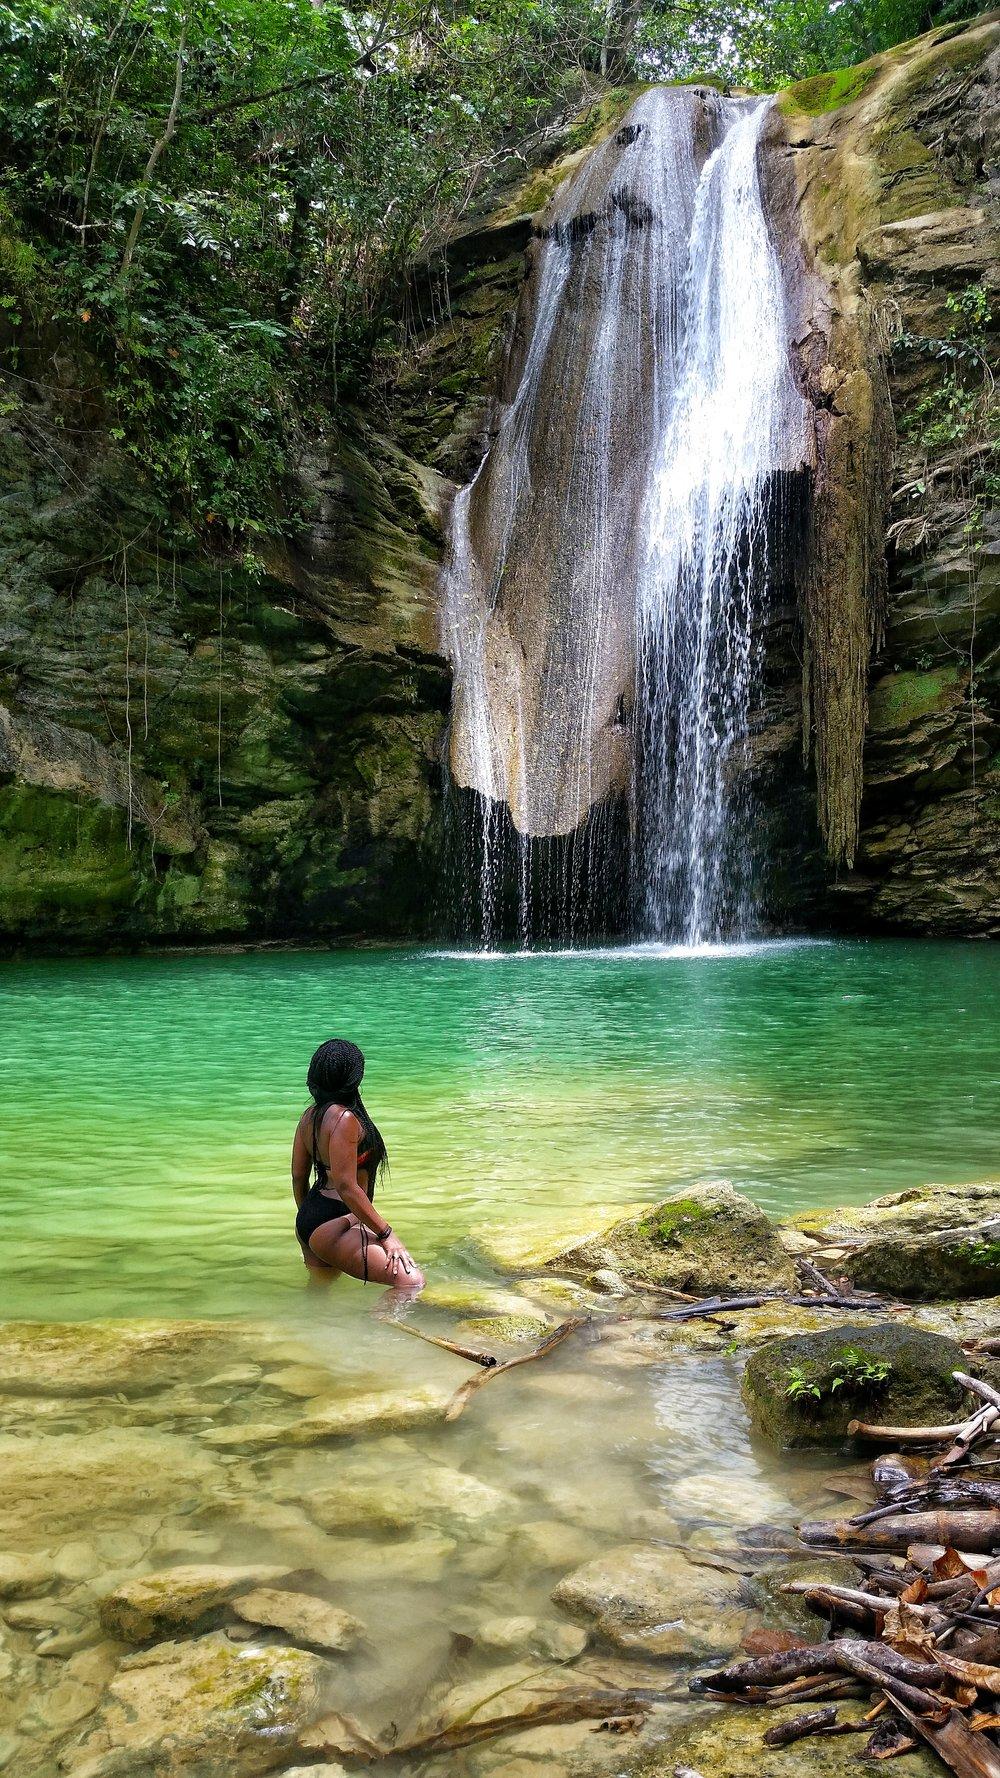 Chilling at Kwame Falls